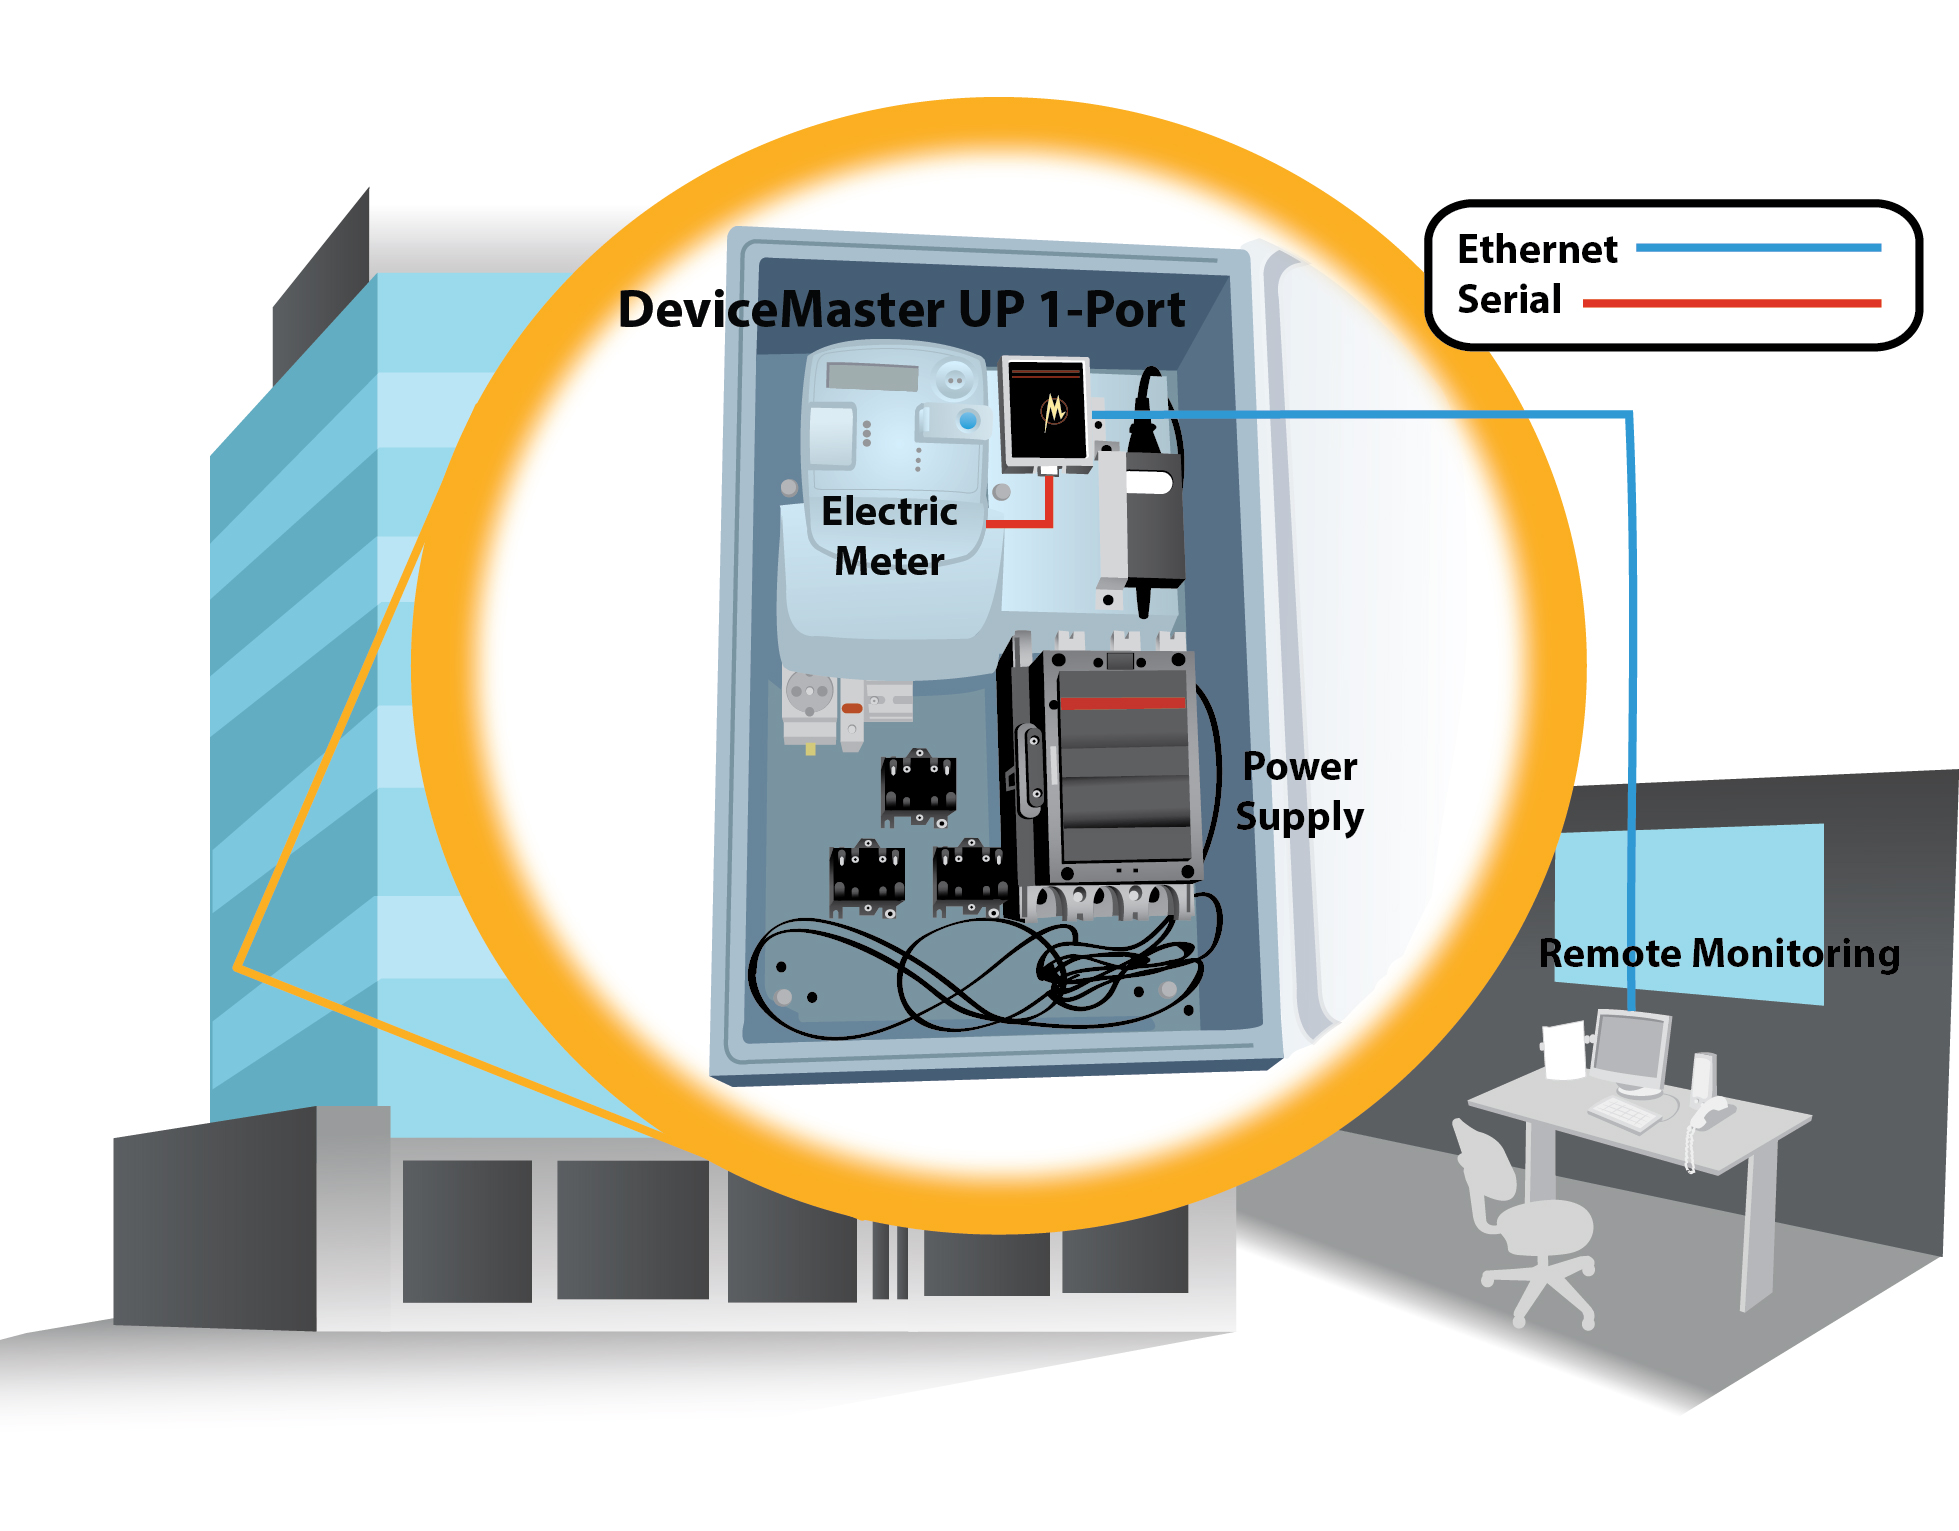 device master ethernet gateway energy connectivity